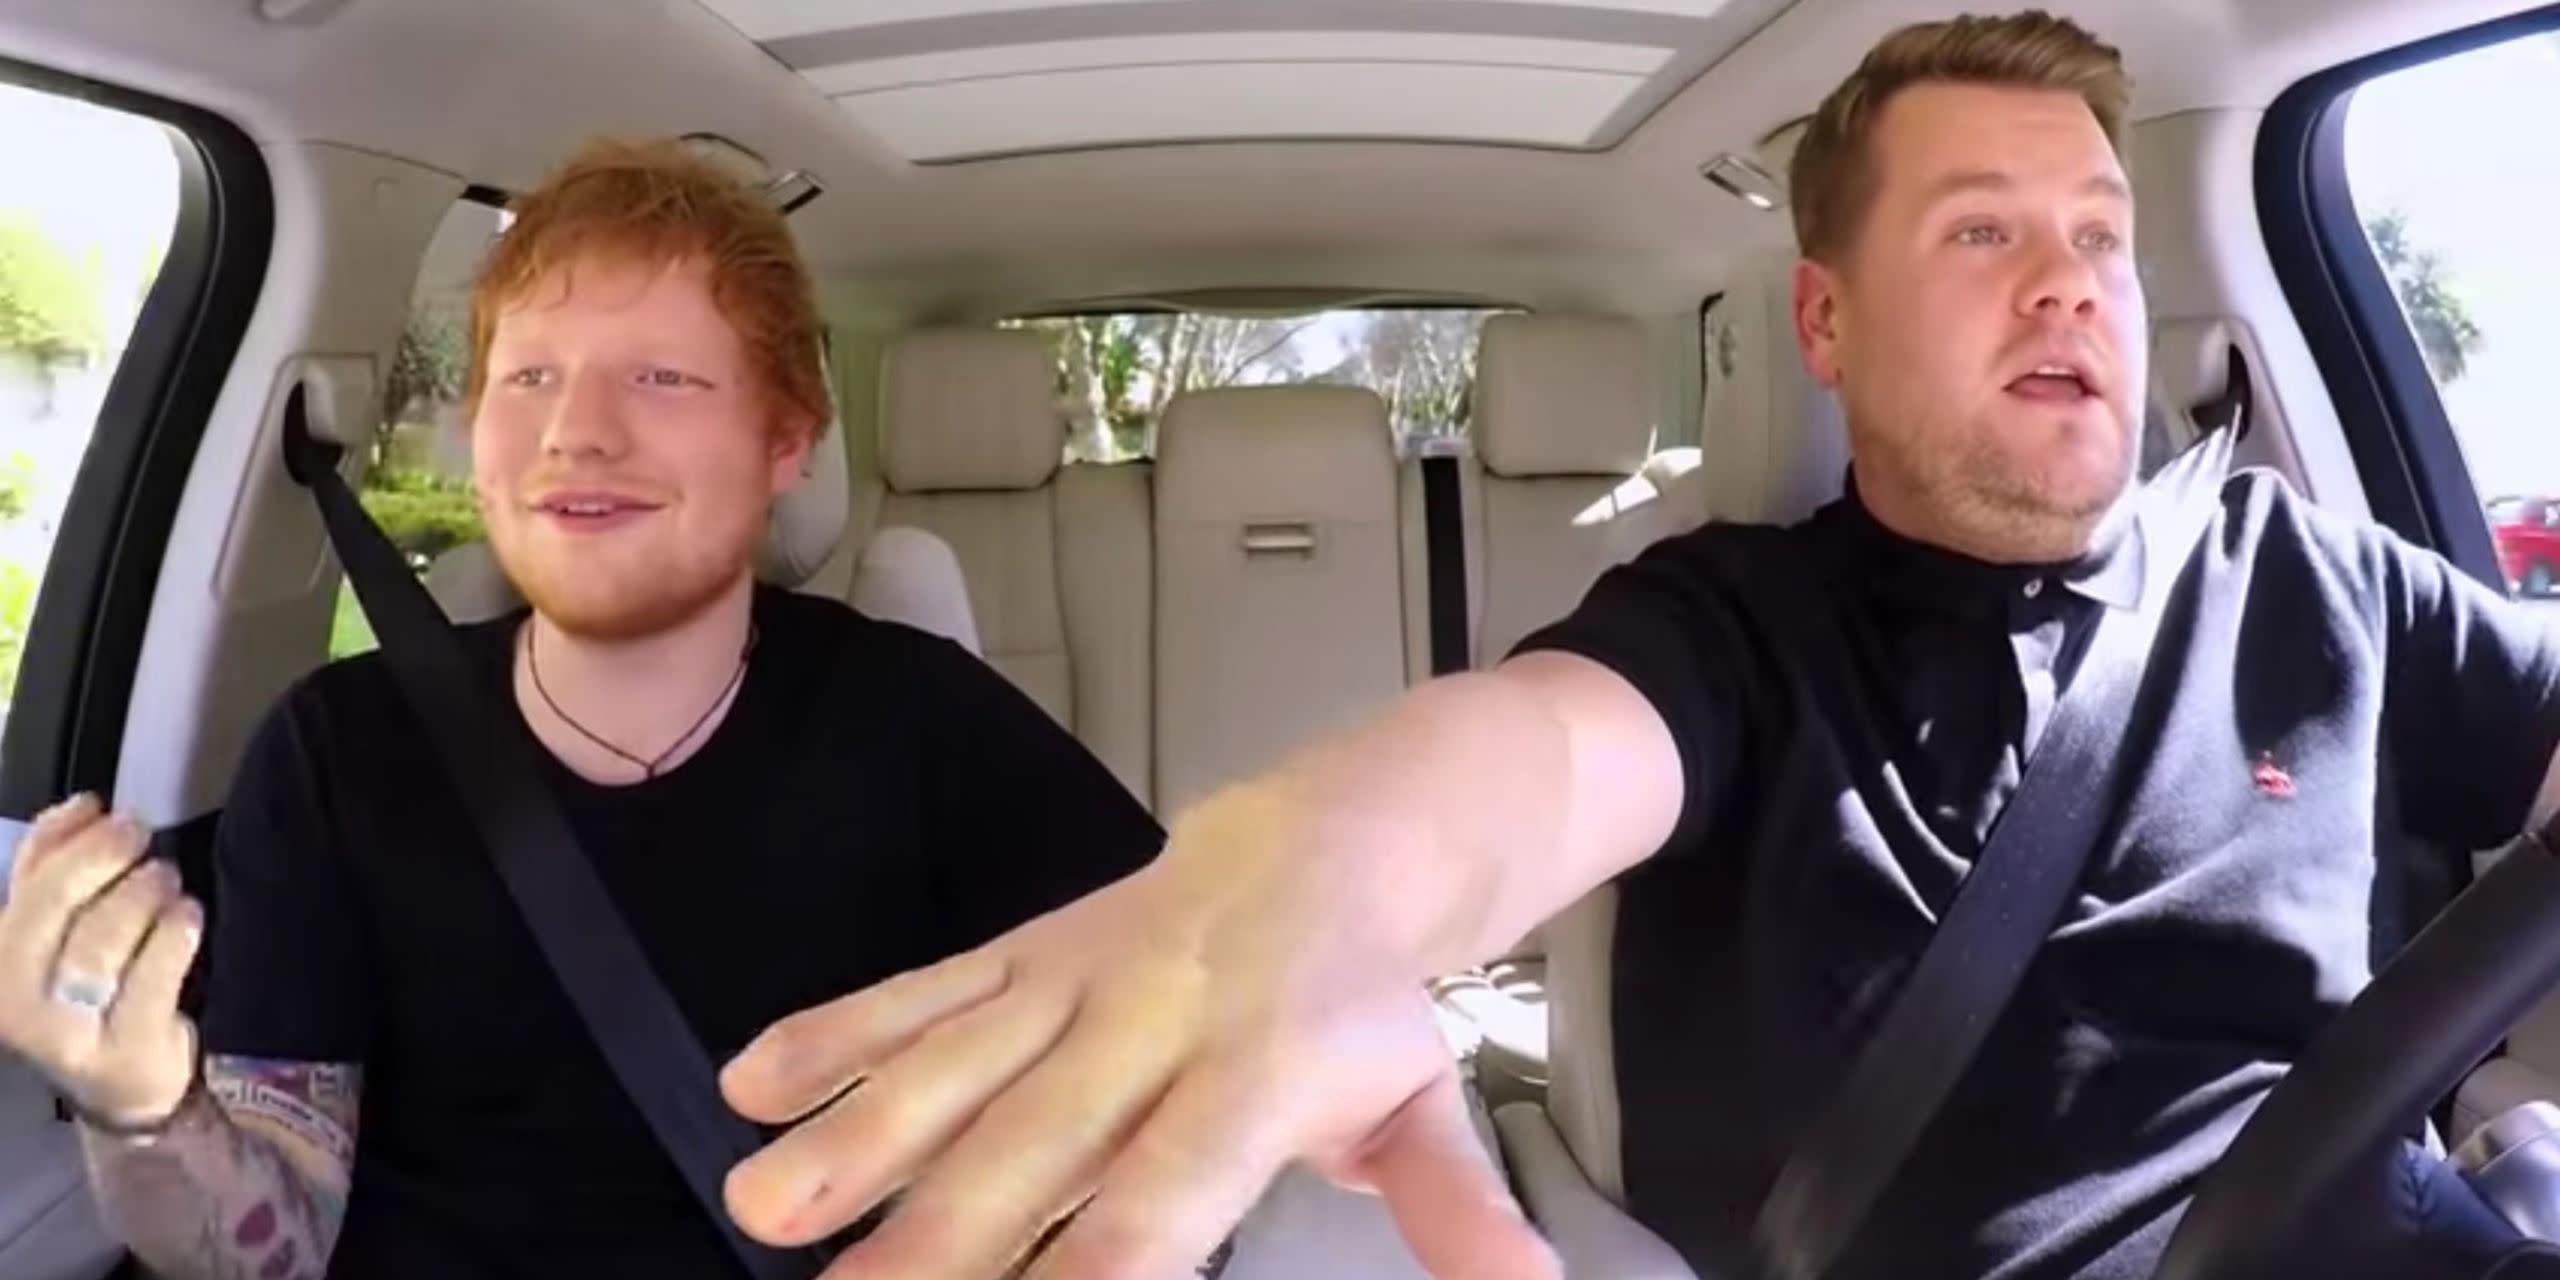 Carpool Karaoke: Its Ed Sheerans turn   Star 104.5 FM